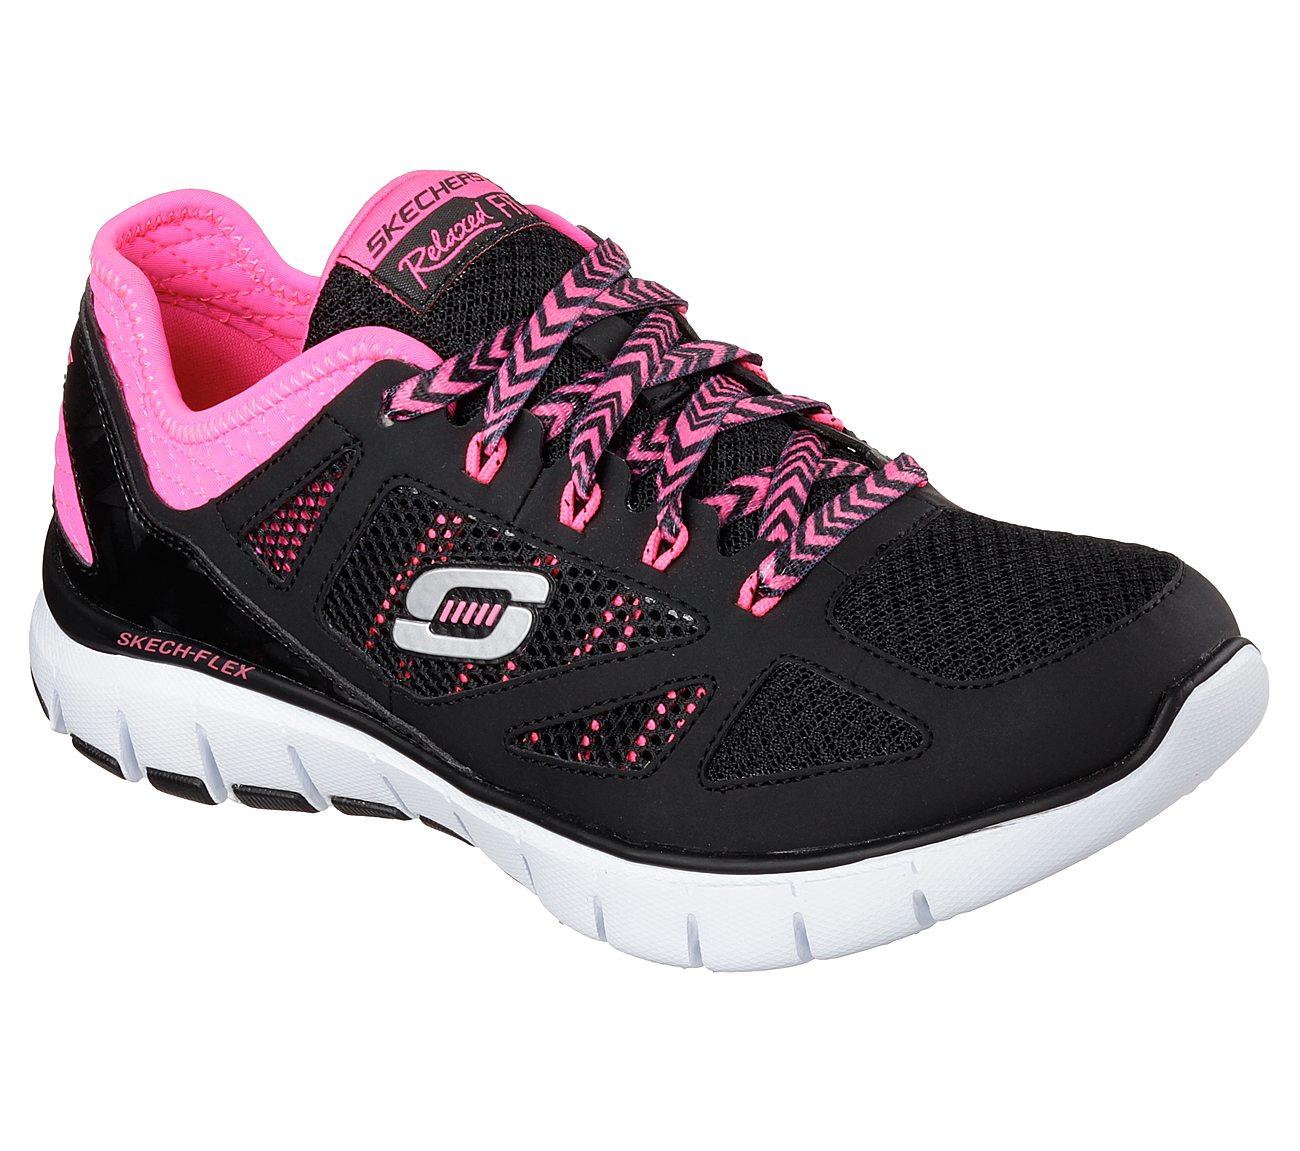 Skechers Skech-Flex Royal Forward 12128 Sport Shoes Color: Black